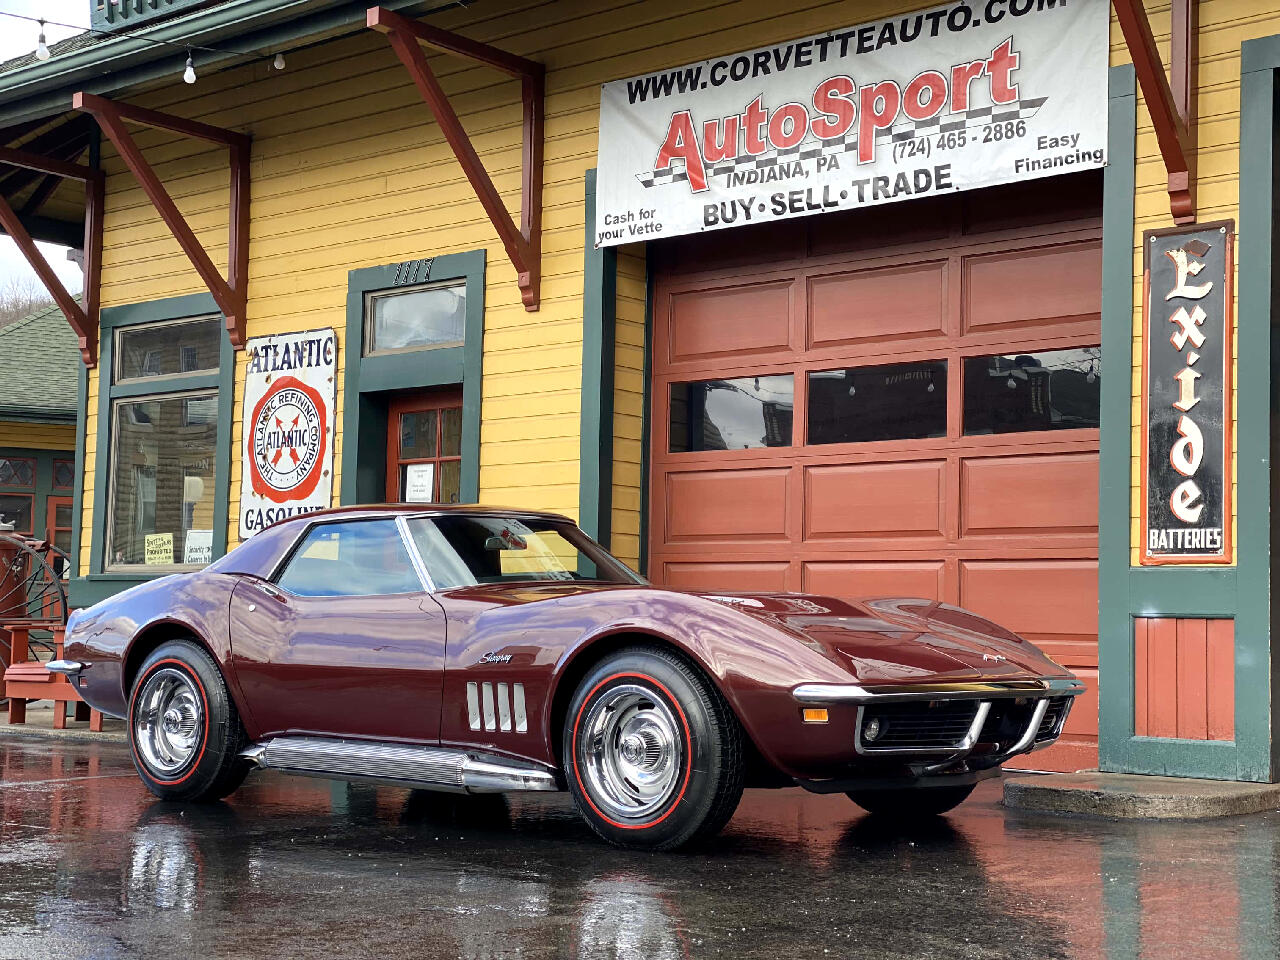 1969 Chevrolet Corvette 1969 Frame Off Restored 427ci Corvette Convertible